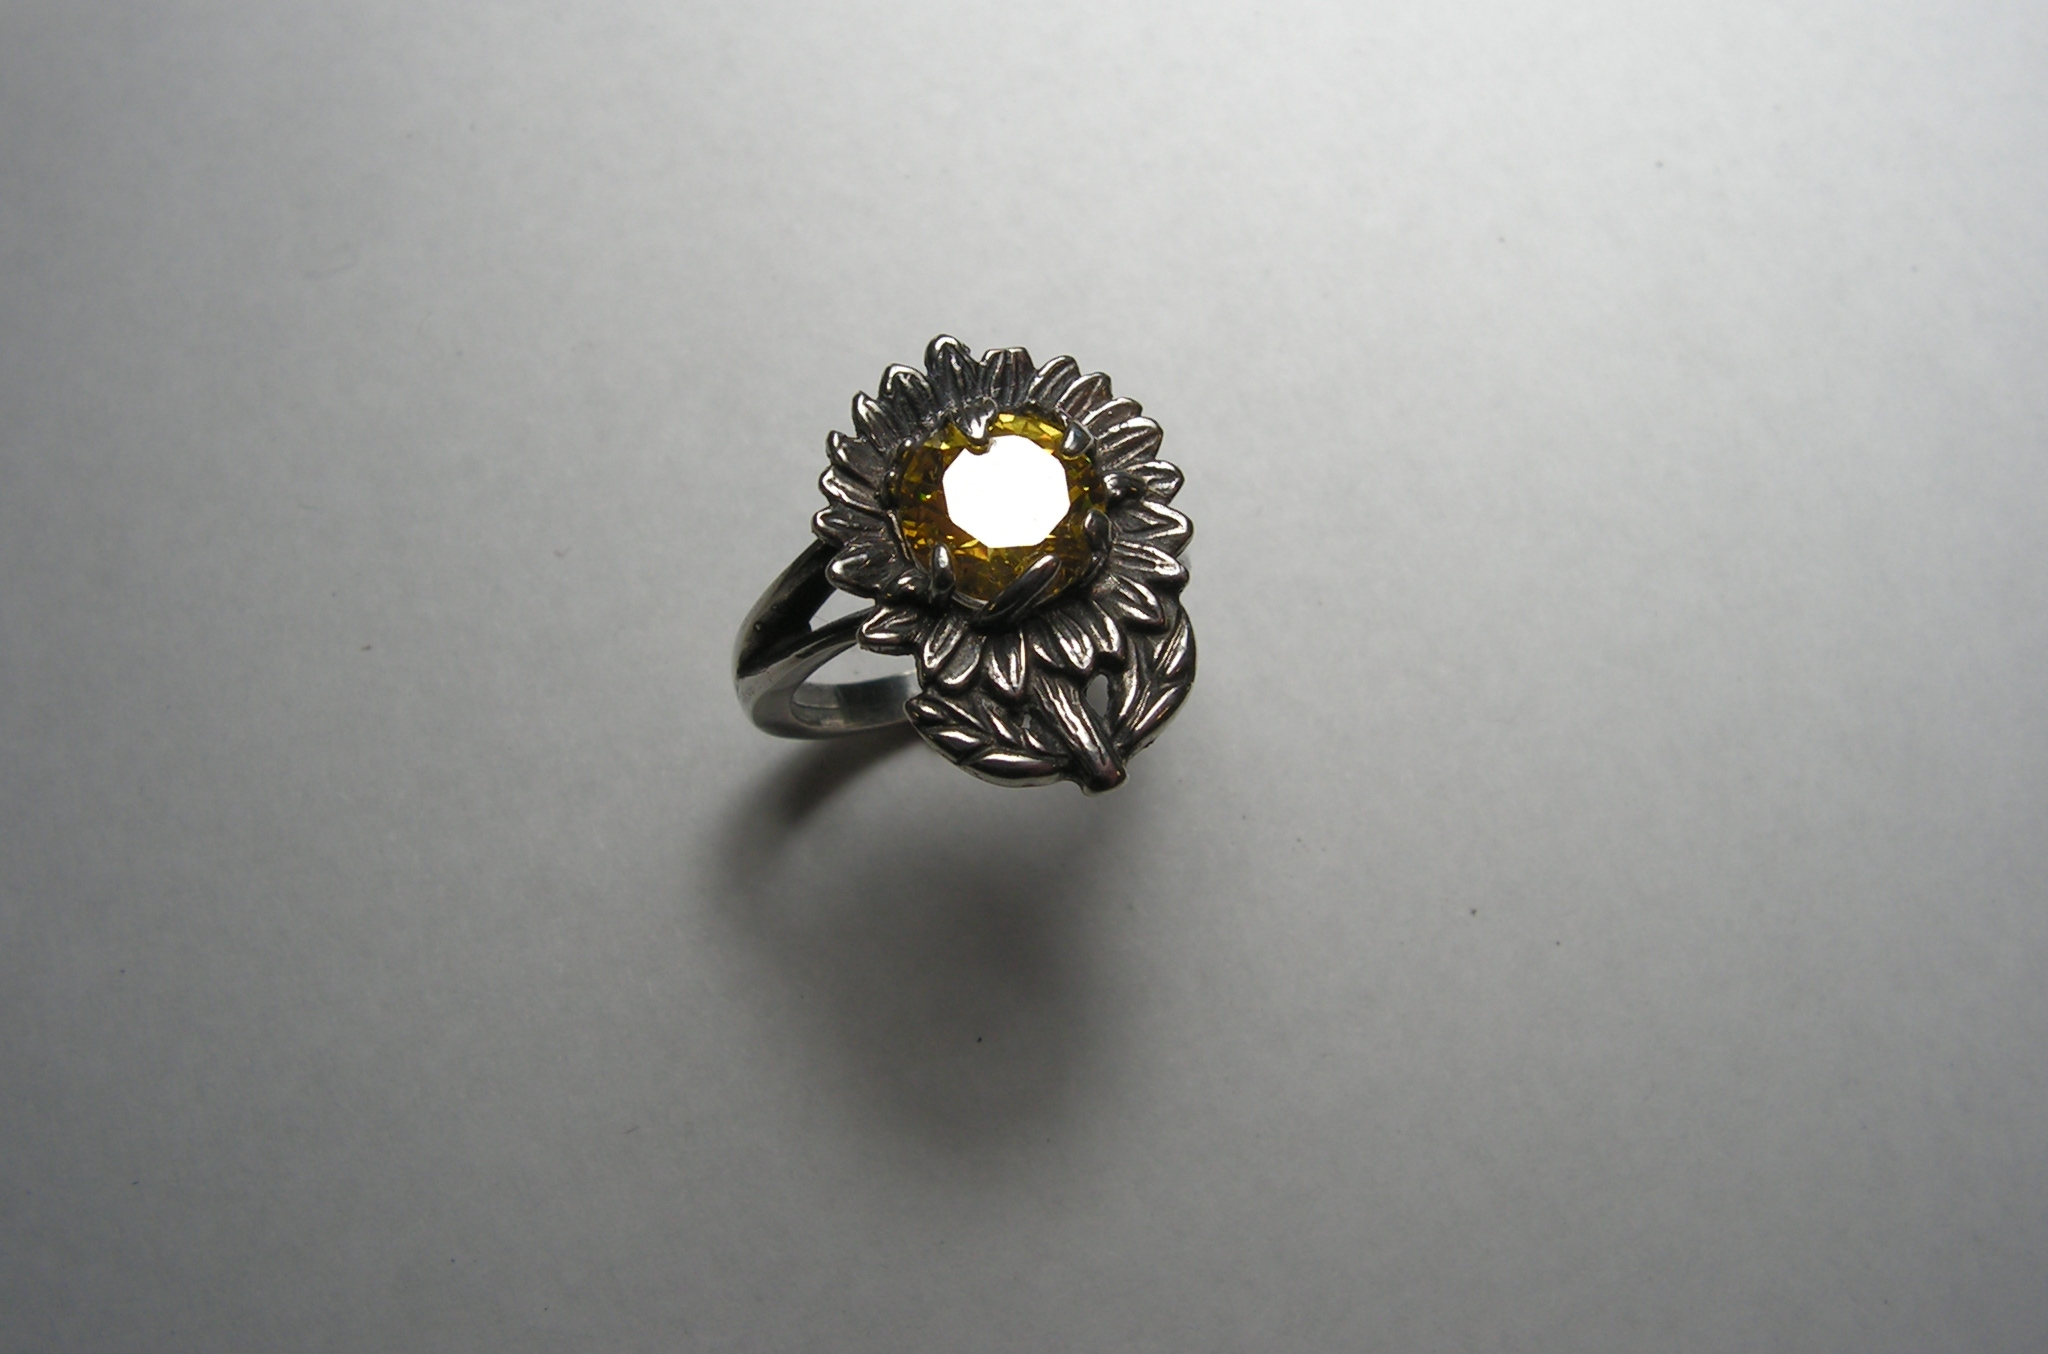 57f467f3b Sterling Silver Sunflower Ring With Citrine $35.00. KONICA MINOLTA DIGITAL  CAMERA. KONICA MINOLTA DIGITAL CAMERA ...